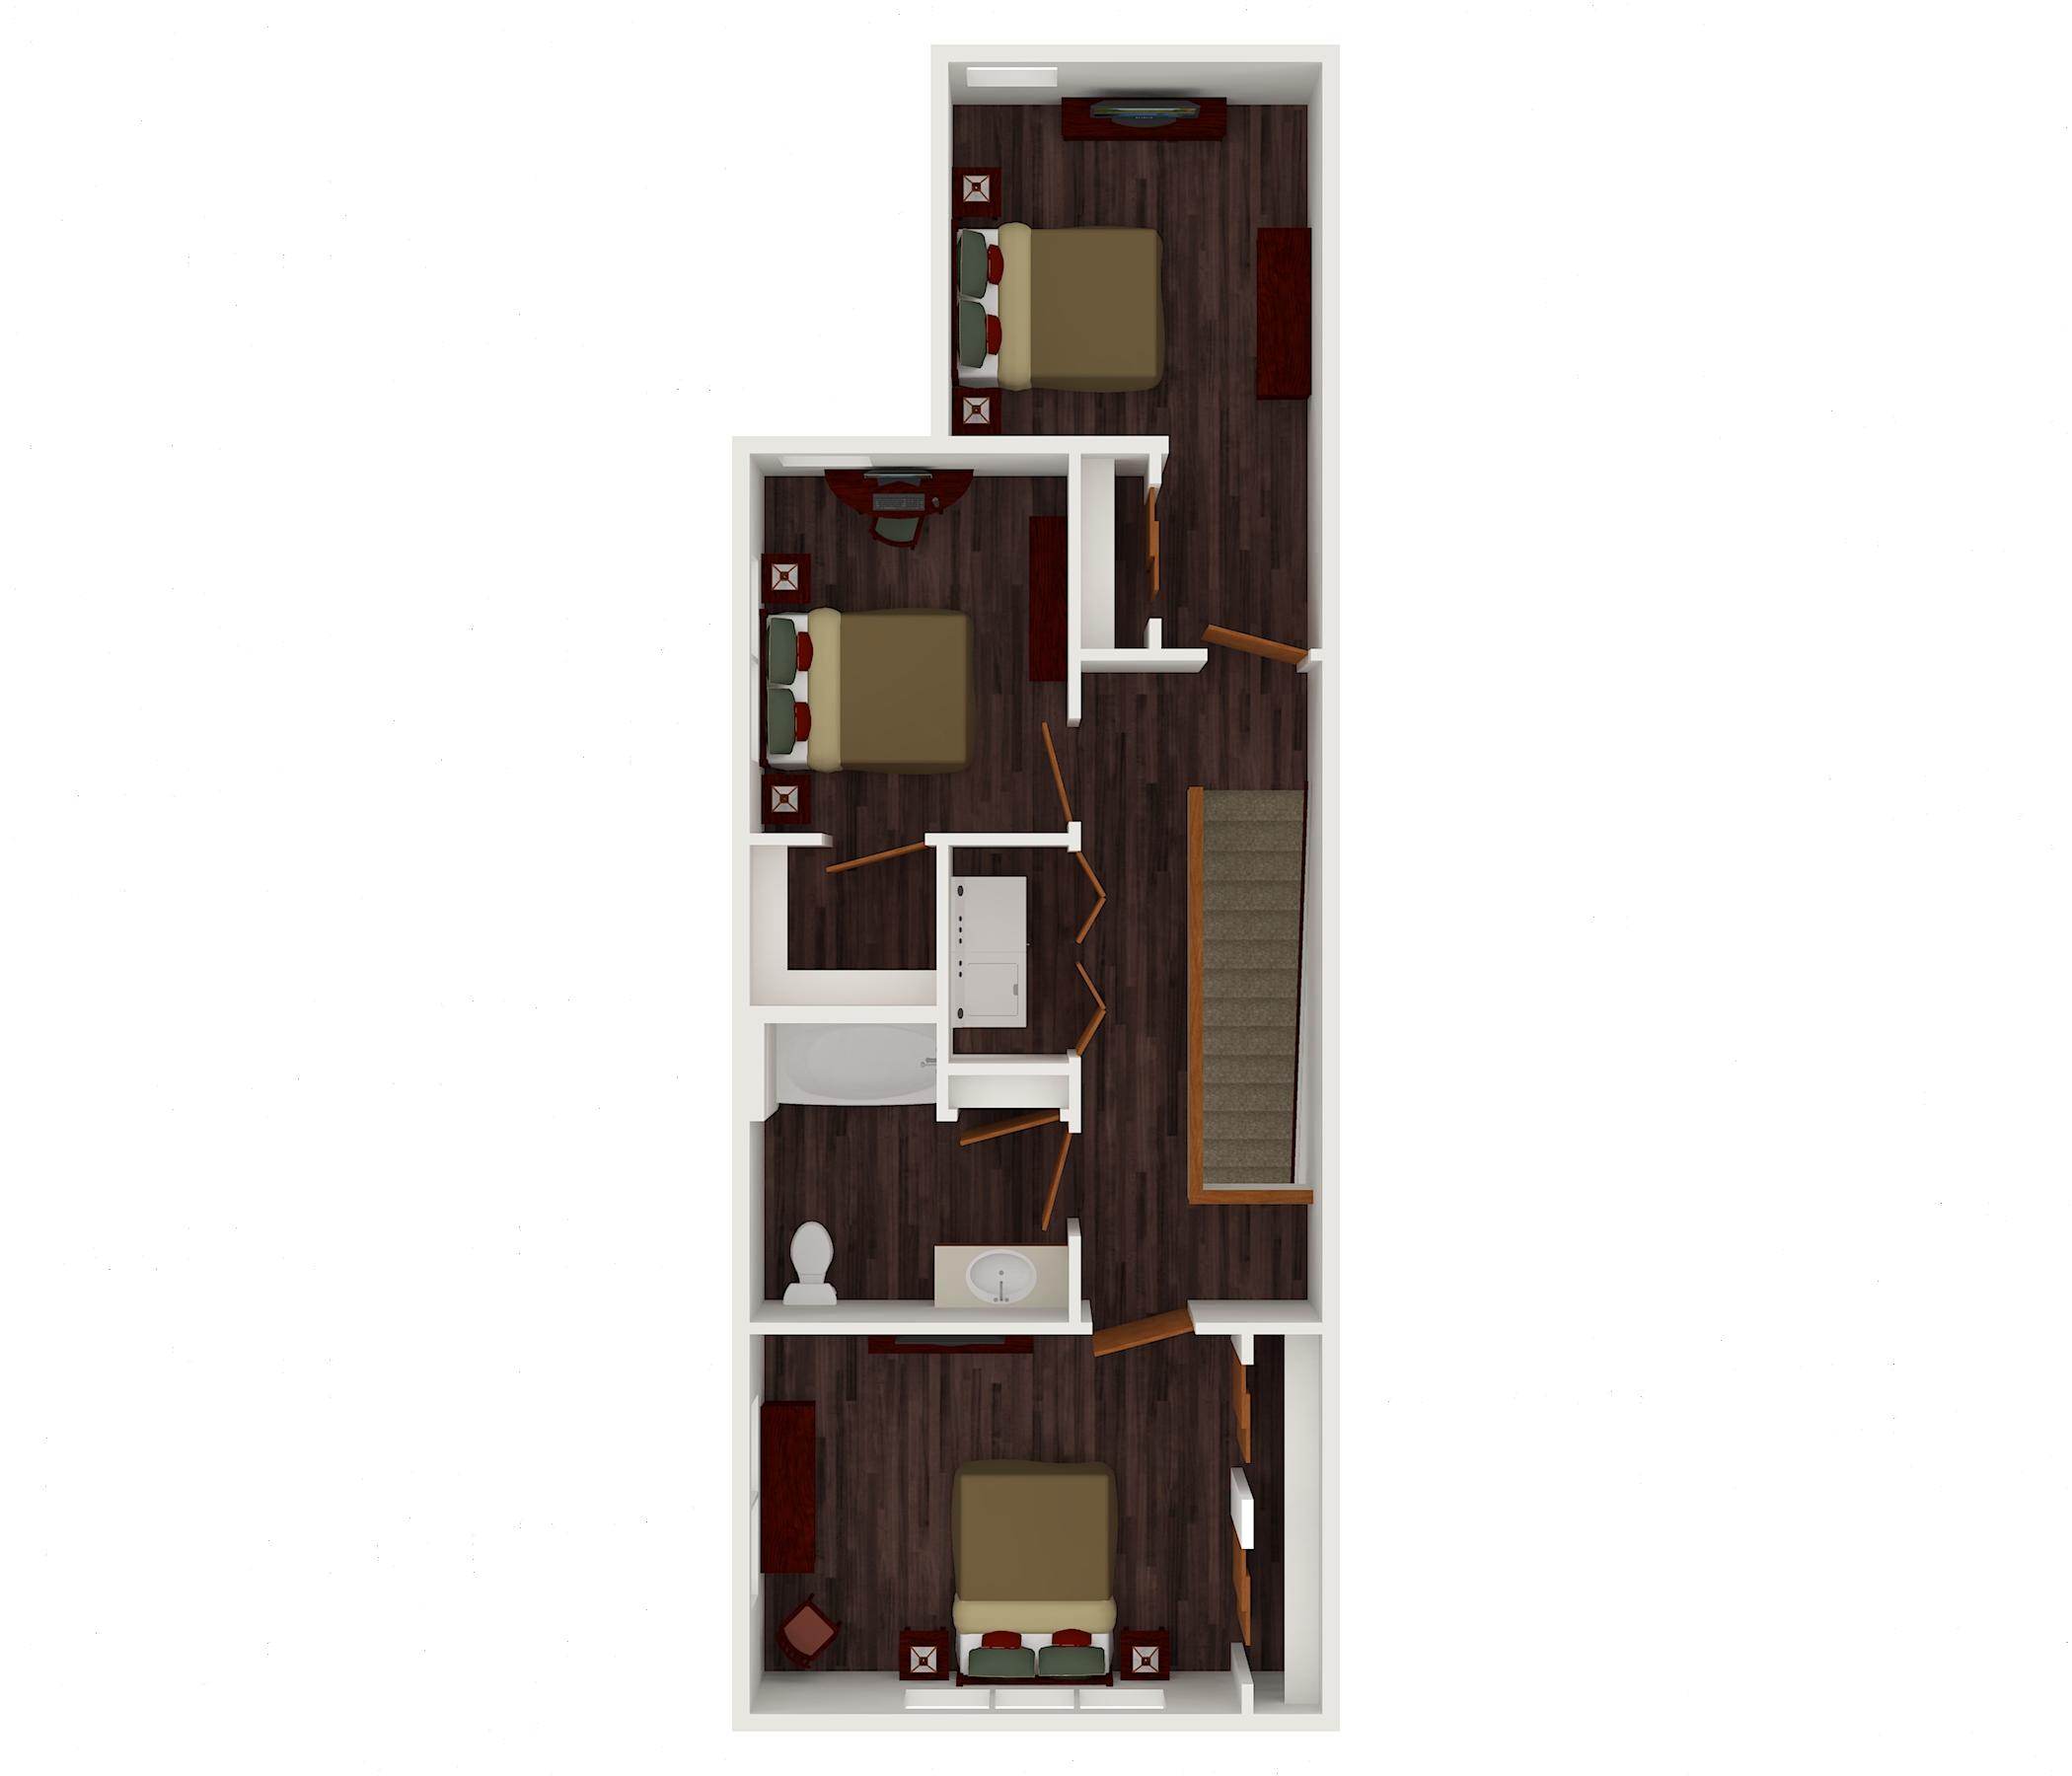 4 bed upper